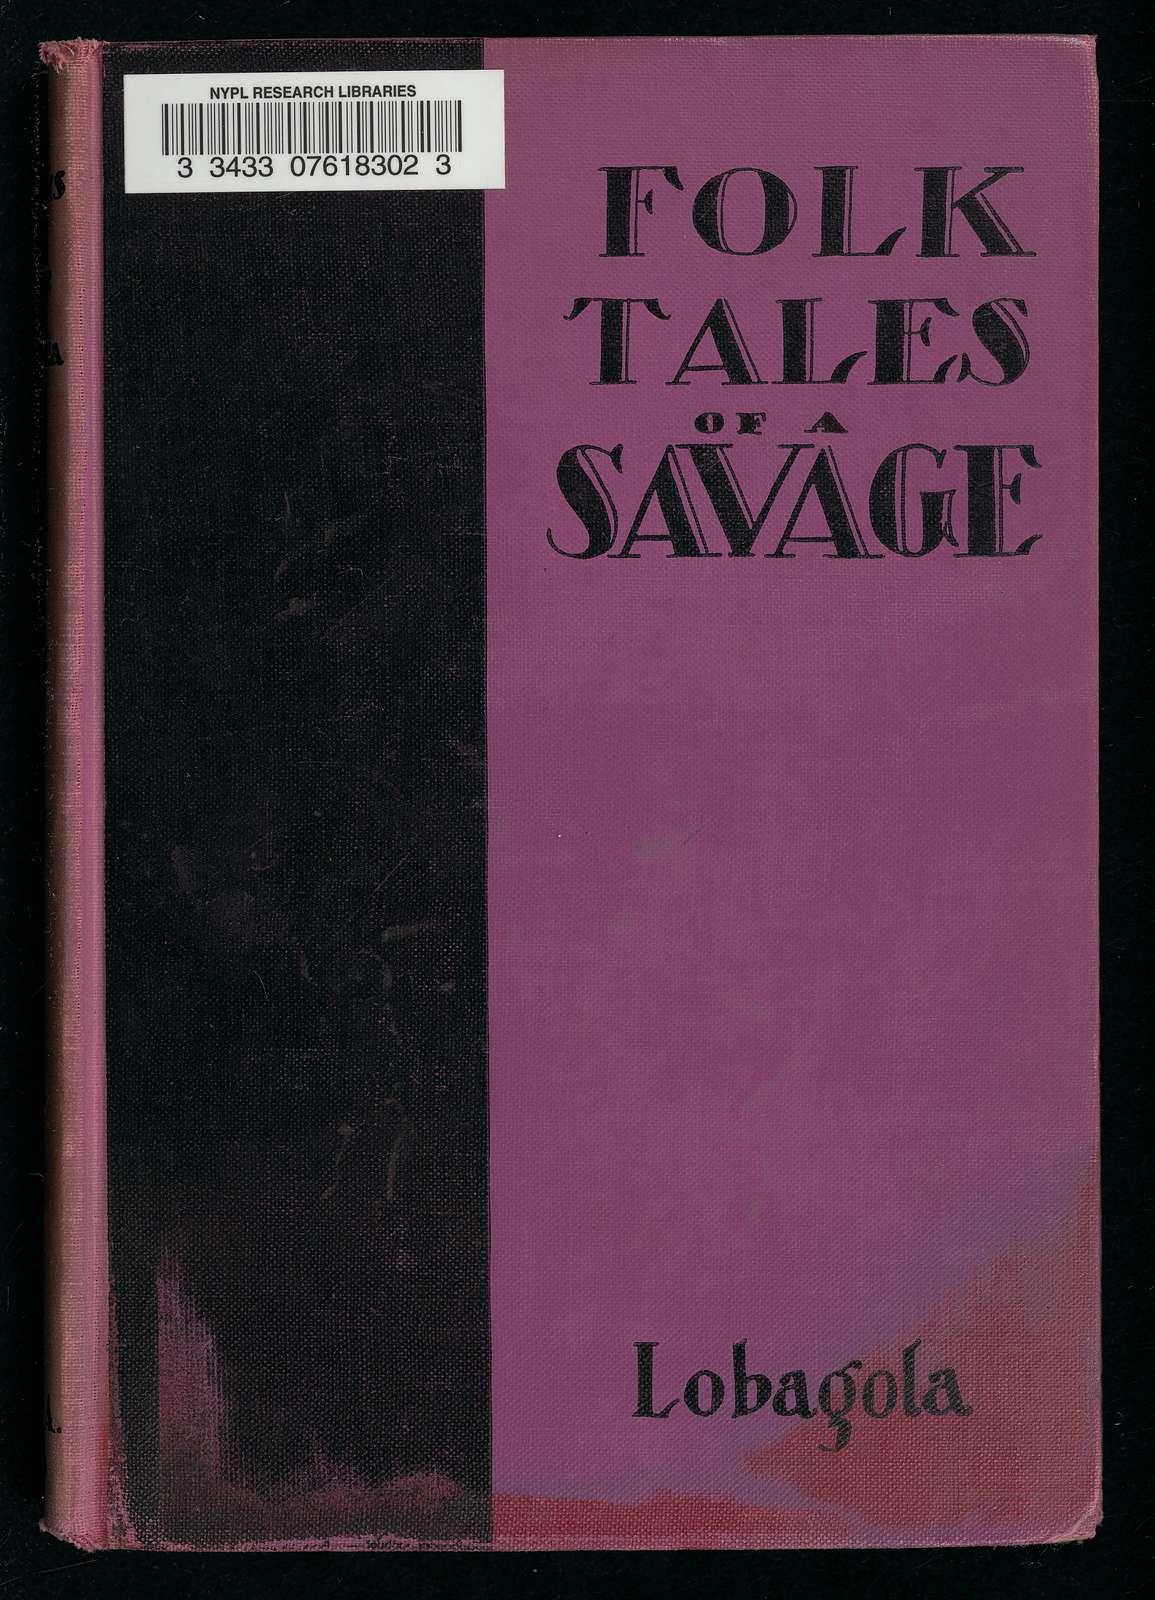 The Folk Tales of a Savage